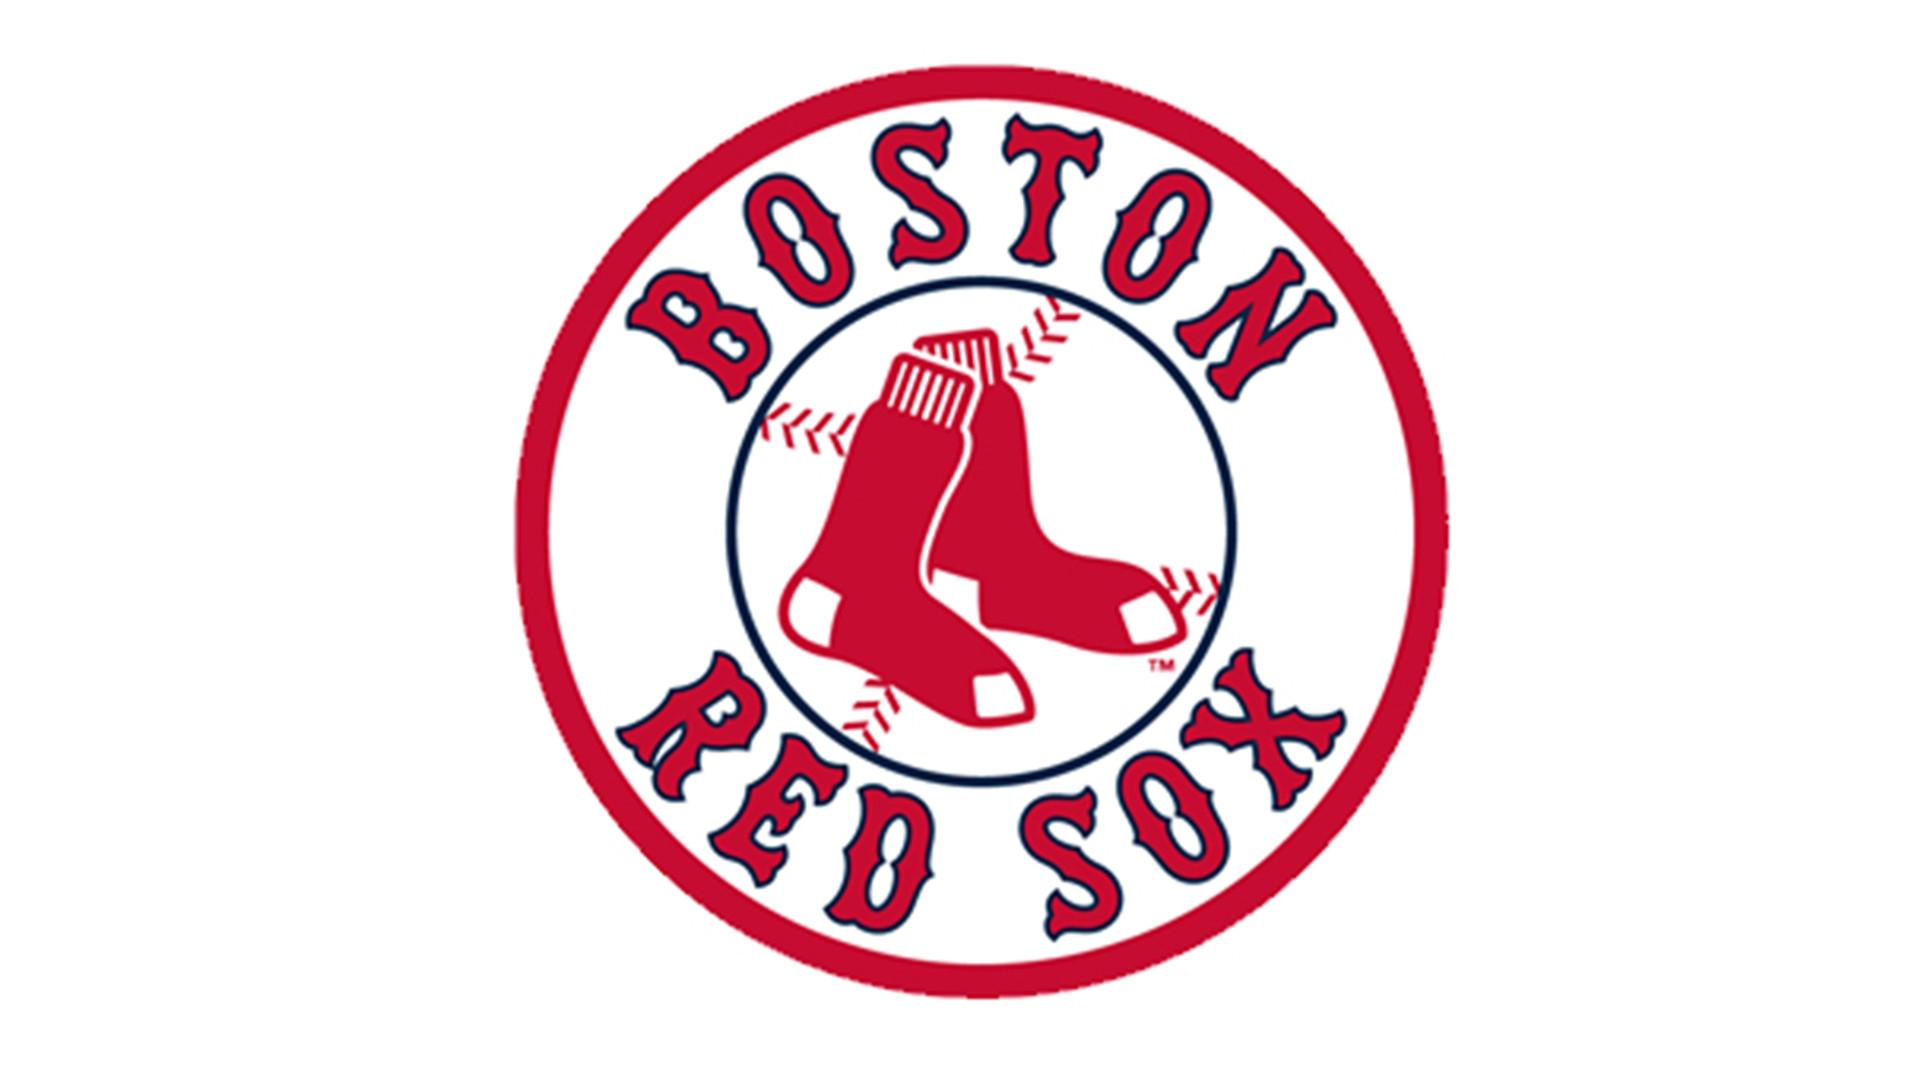 Boston Redsox Red Sox Logo Wallpaper #2542 – Resolution 1366×768 px   Red  Sox Wallpaper   Pinterest   Red socks